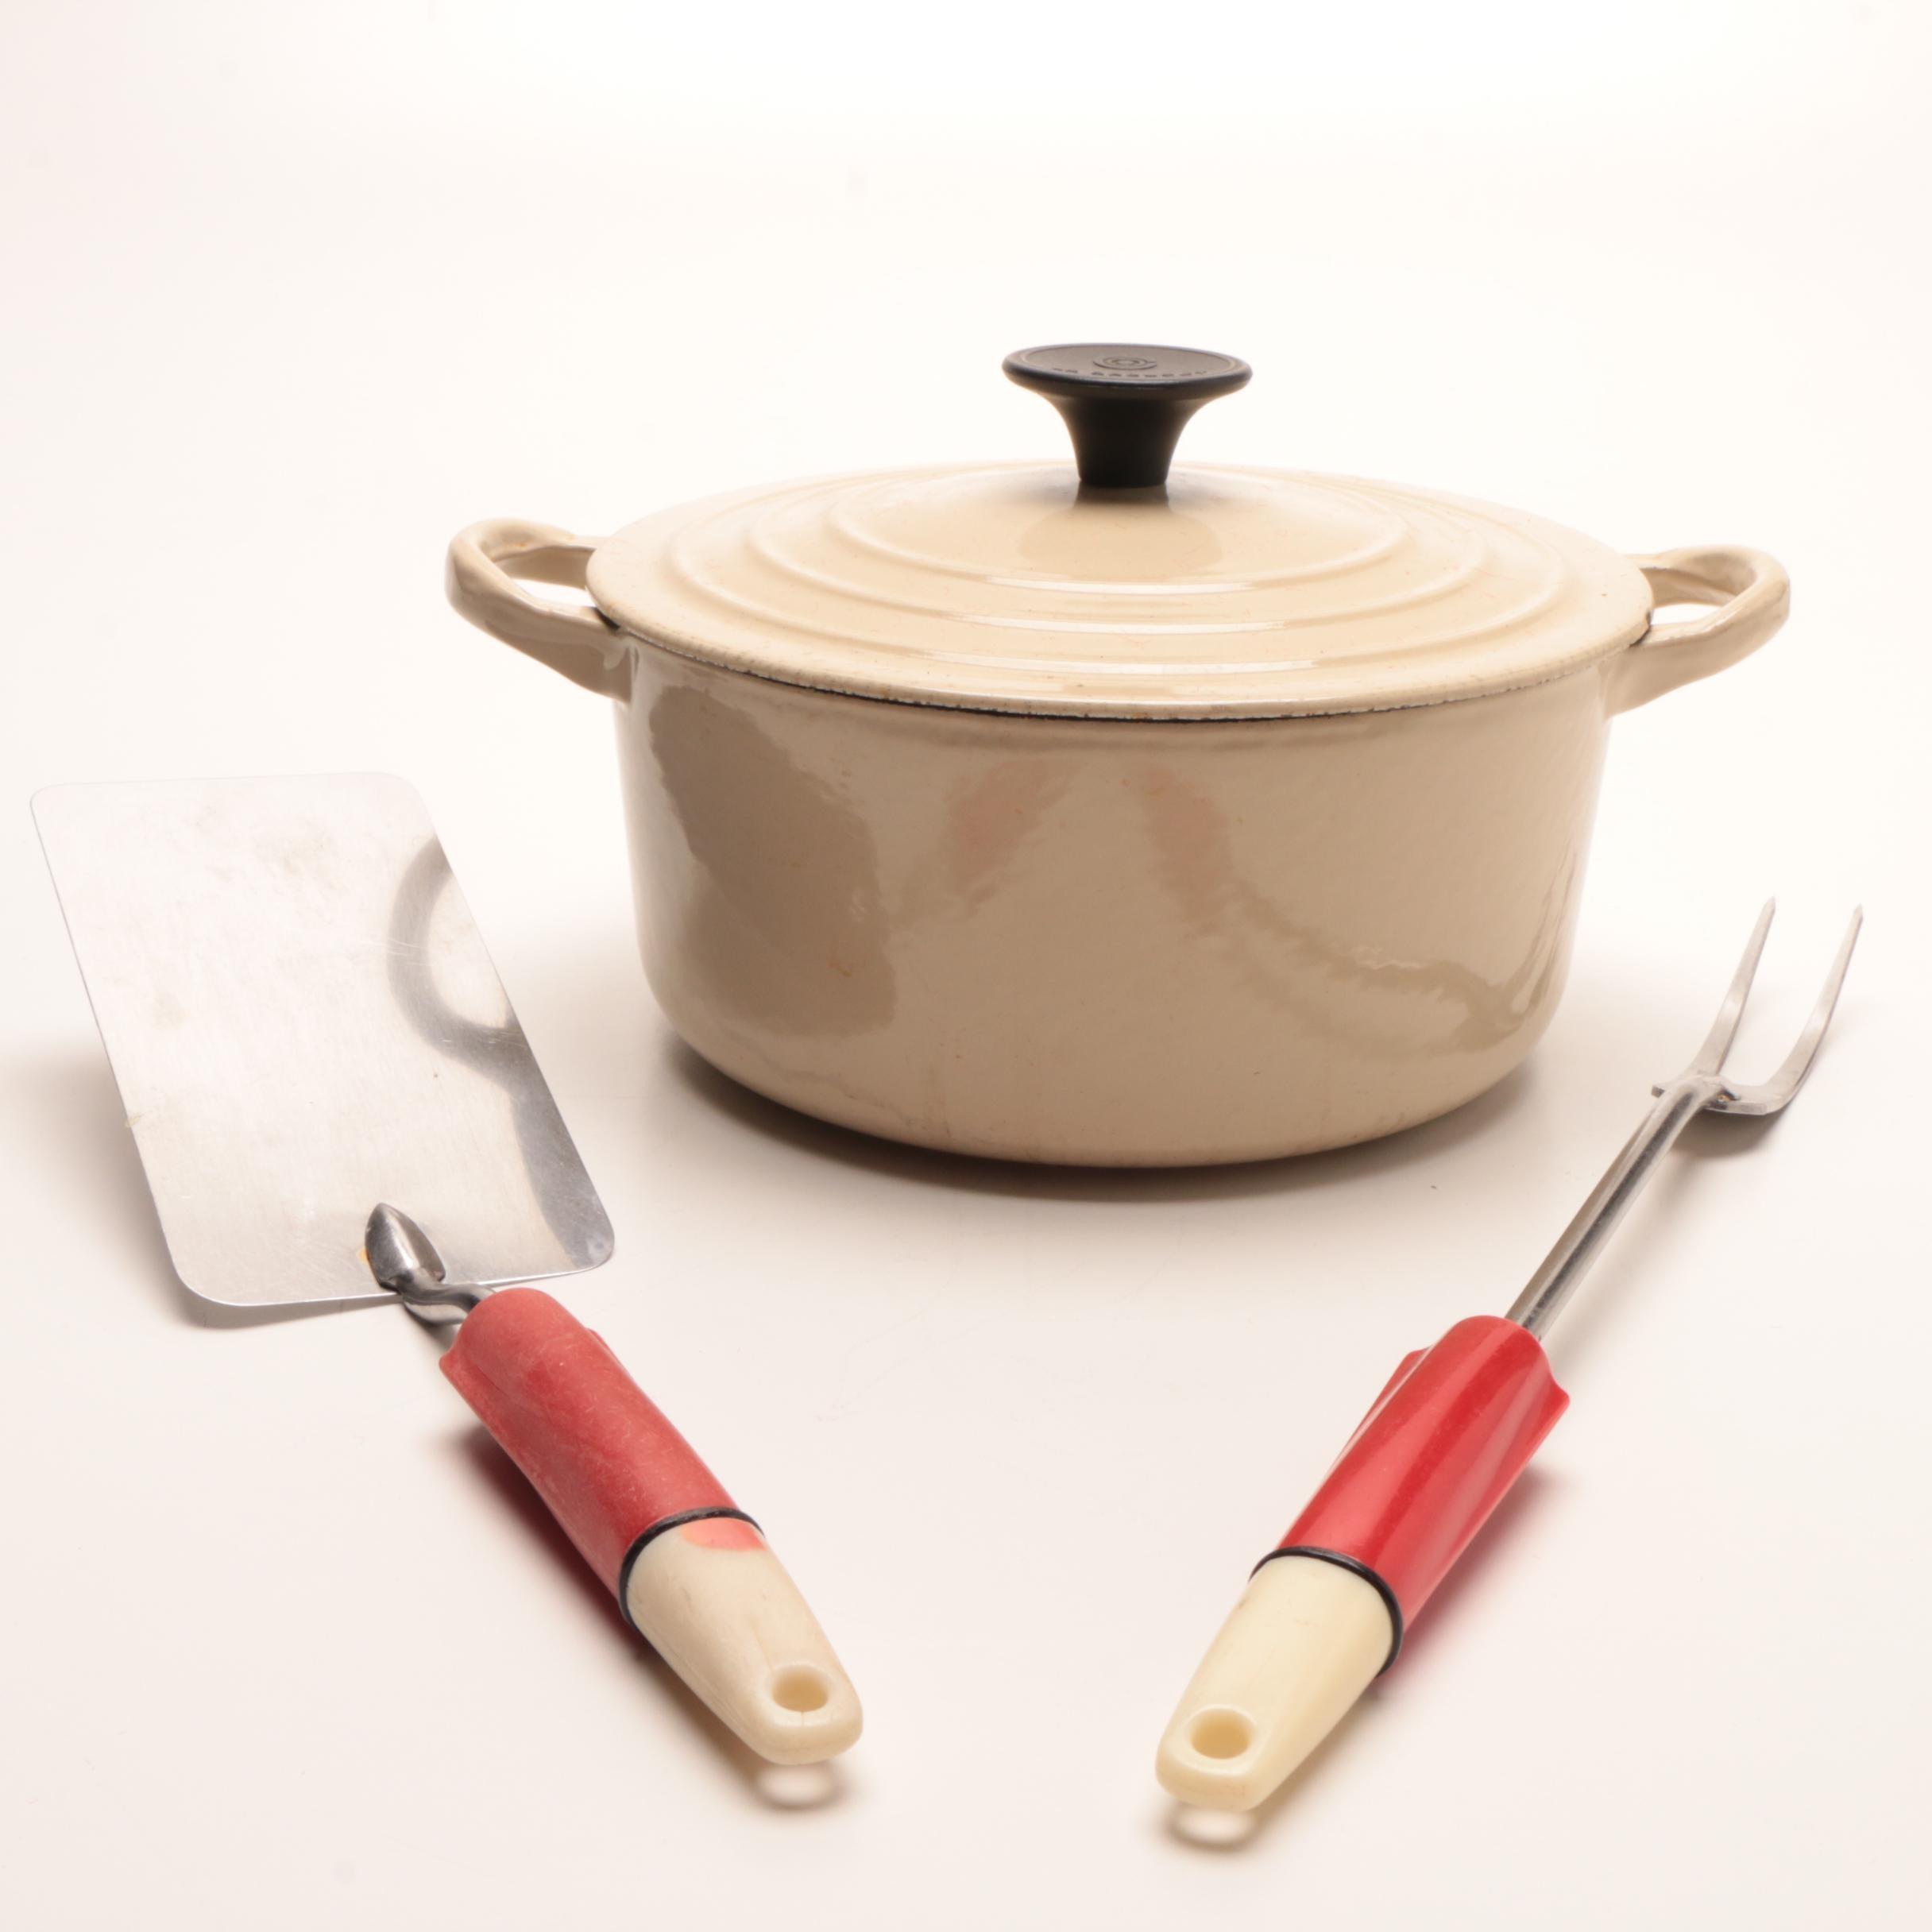 Le Creuset Enameled Cast Iron Dutch Oven and Ekcoline Kitchen Tools